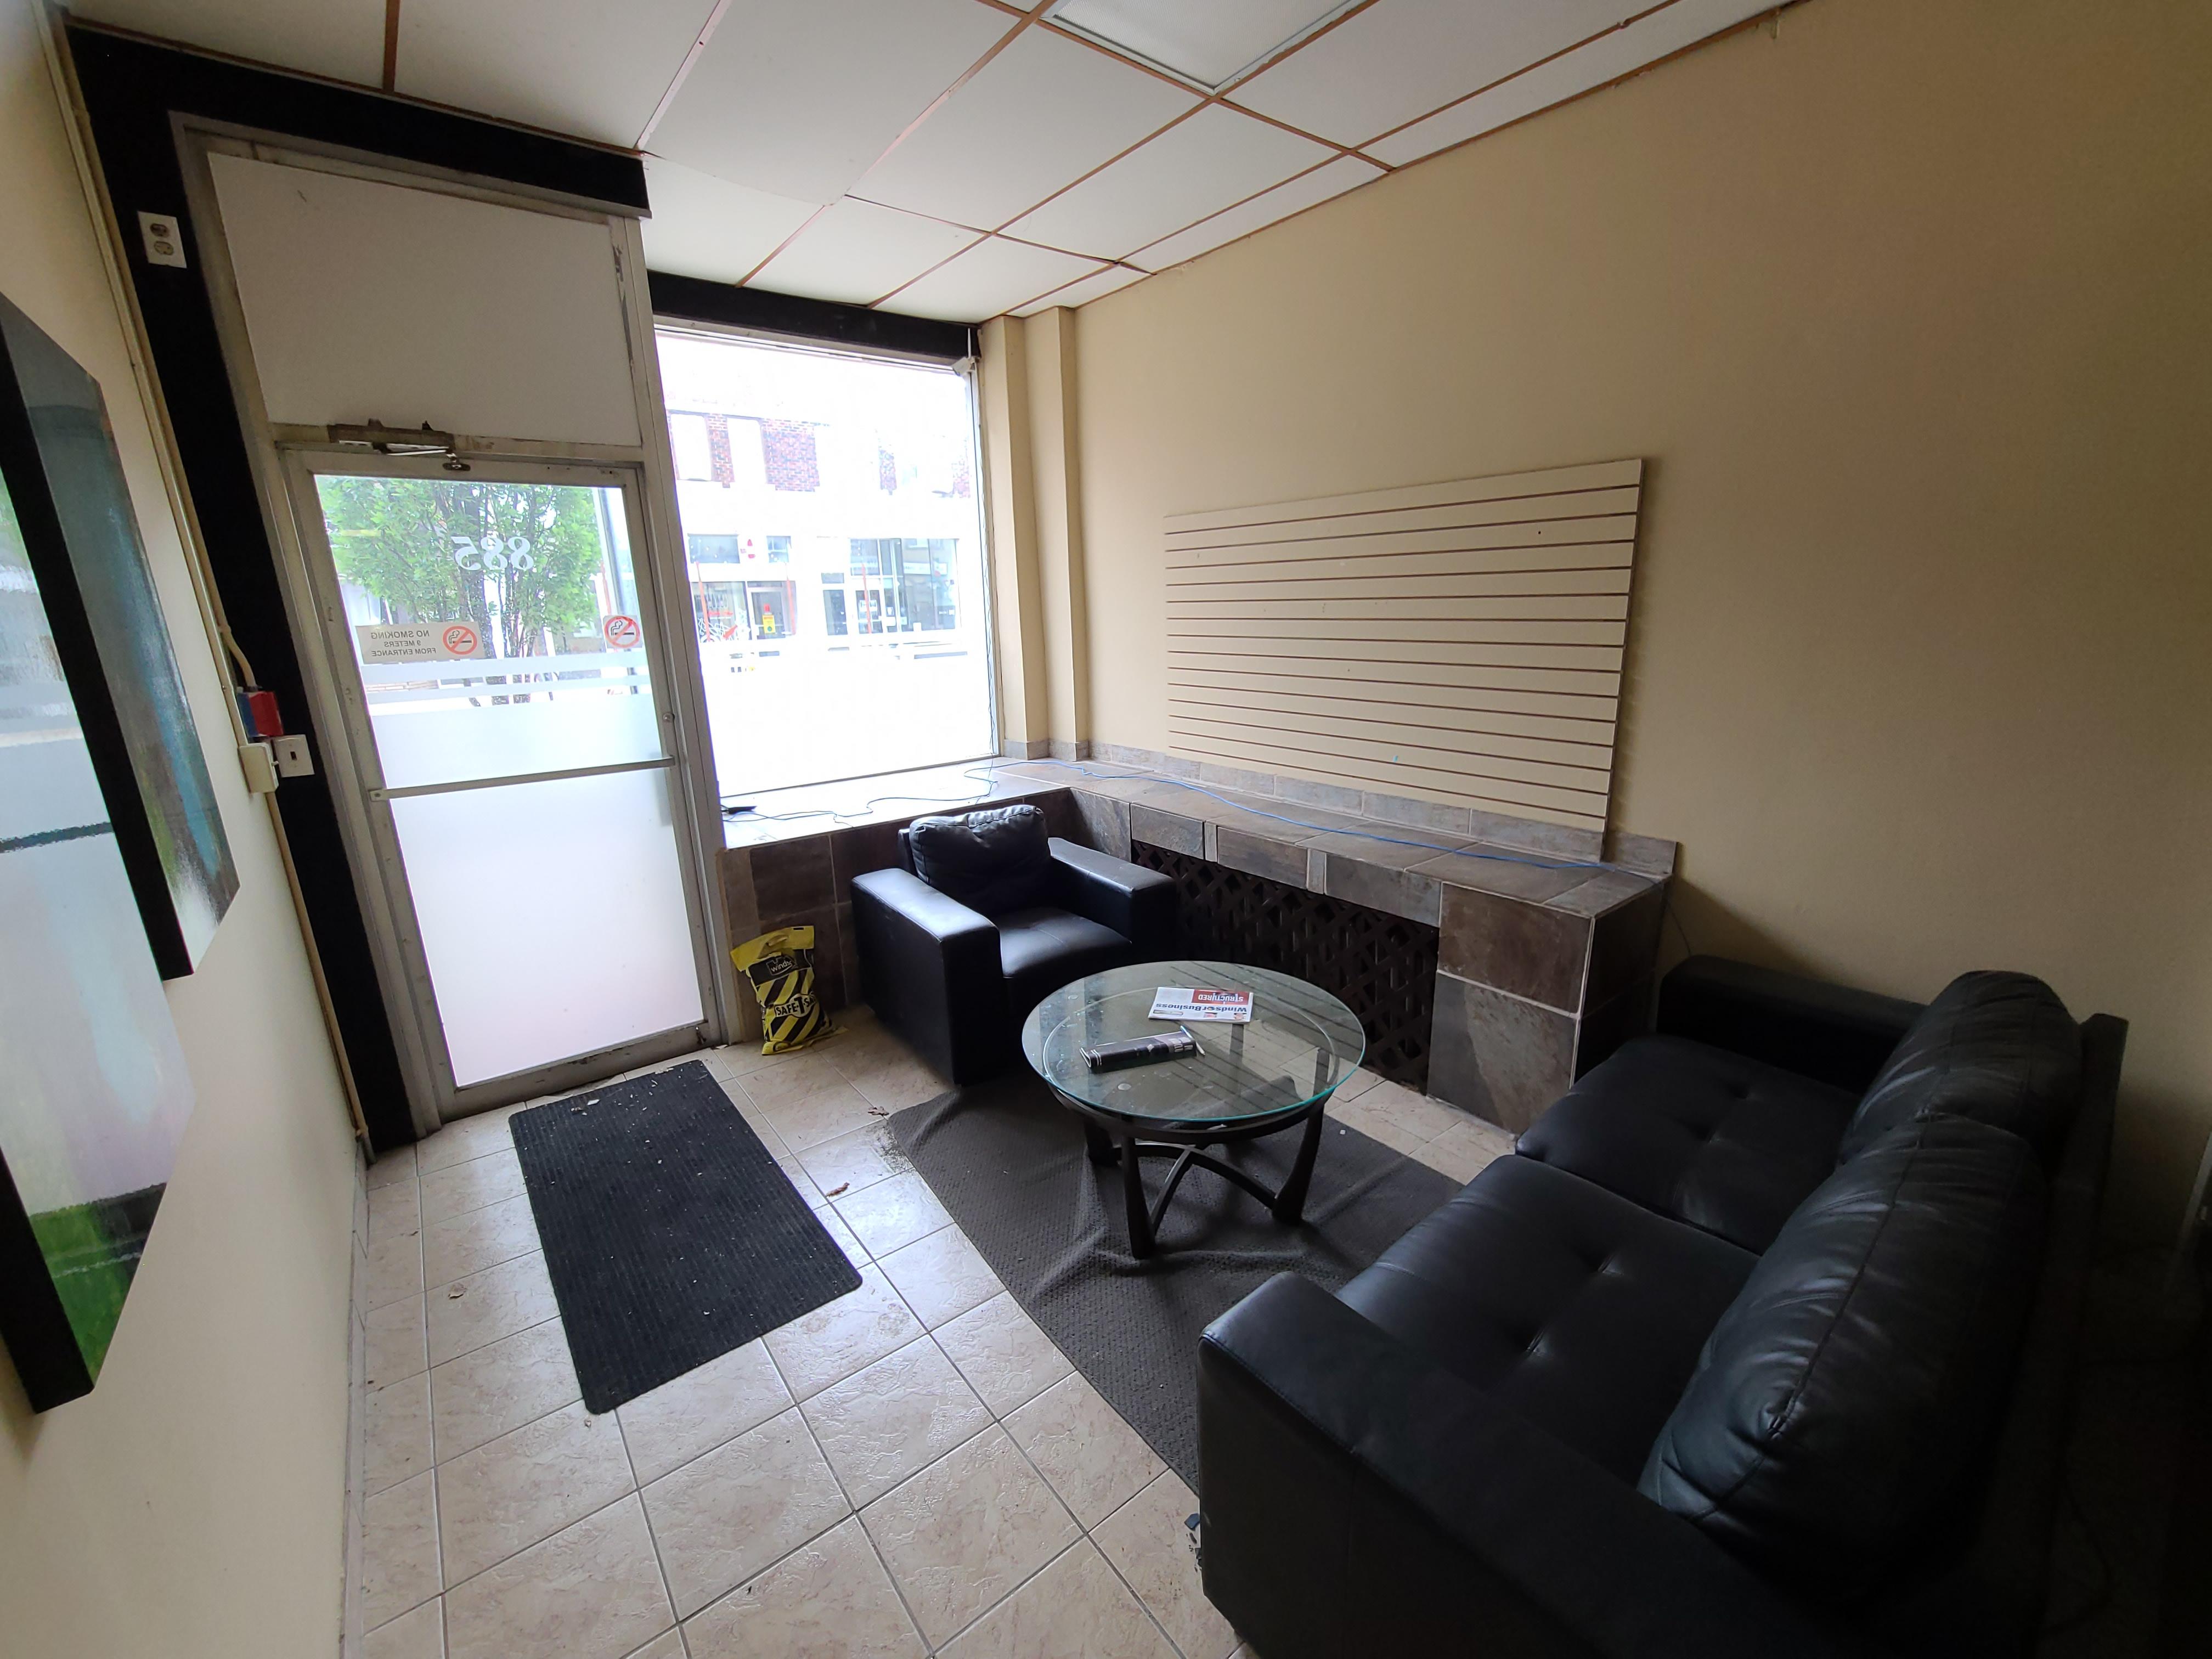 881-883-885 Erie Street E, Windsor, Ontario  N9A 3Y7 - Photo 7 - RP1188742101